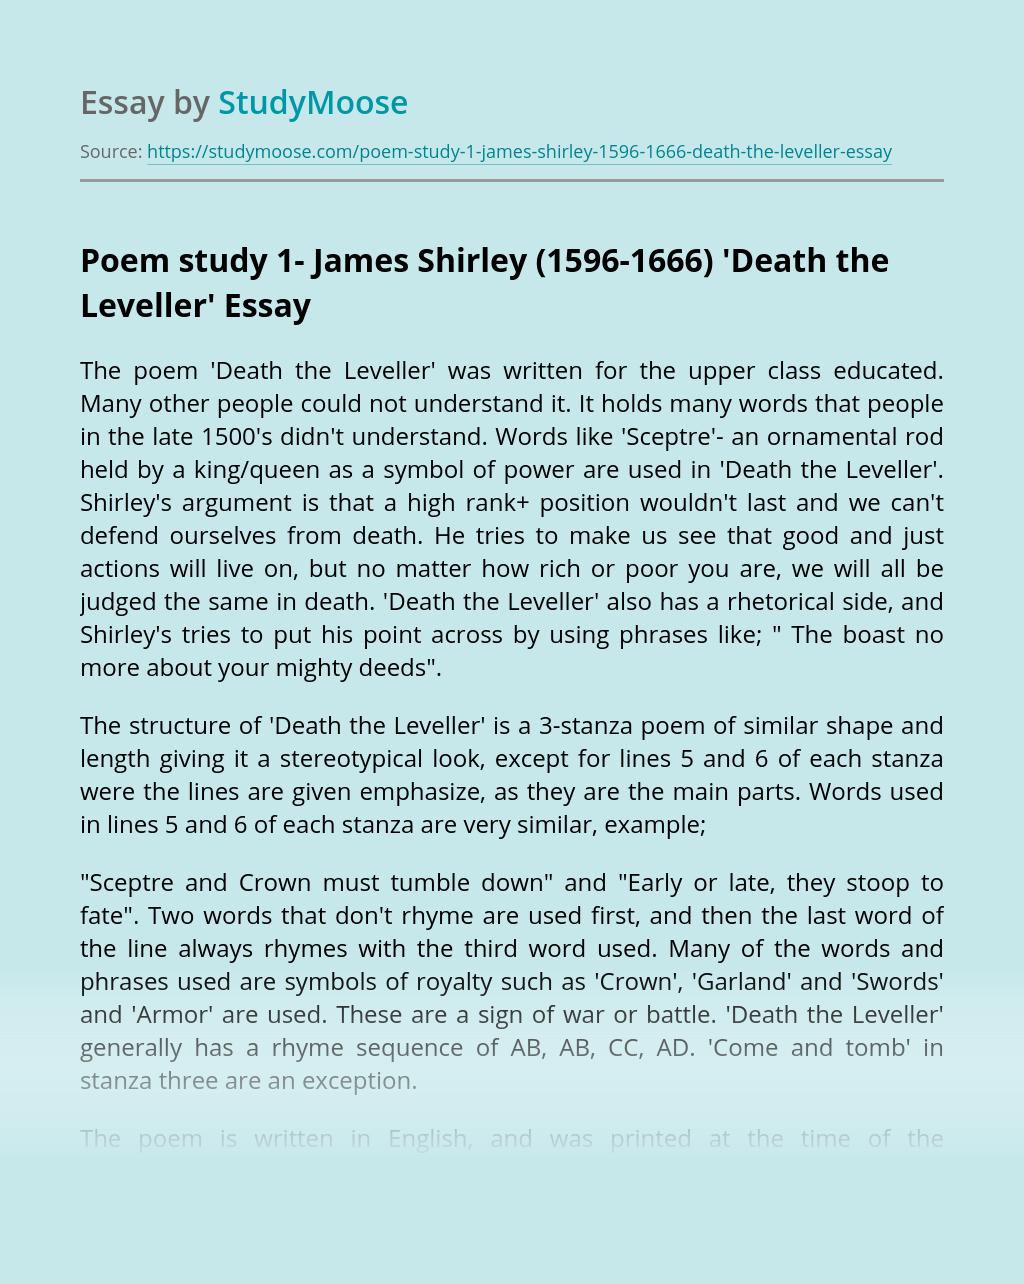 Poem study 1- James Shirley (1596-1666) 'Death the Leveller'